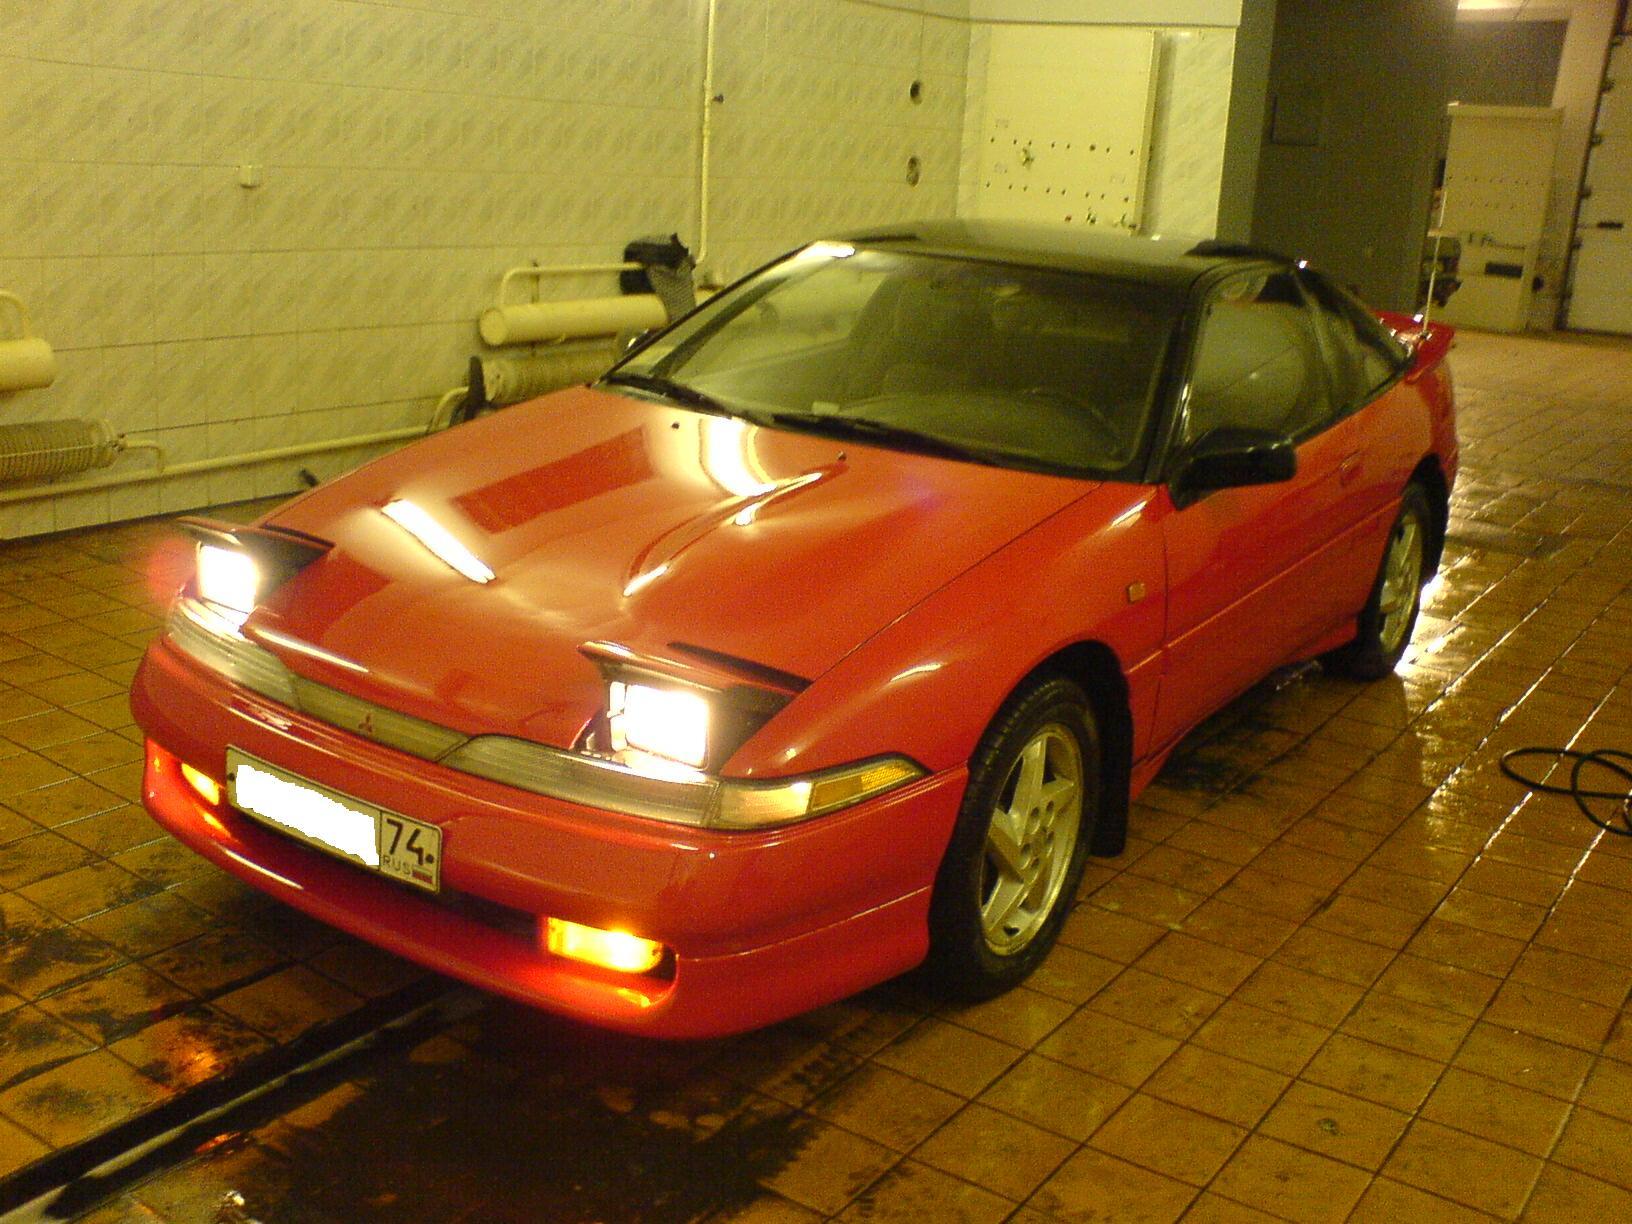 1993 mitsubishi eclipse pictures 2000cc gasoline manual for sale rh cars directory net 1997 Mitsubishi Eclipse 1992 mitsubishi eclipse manual free online